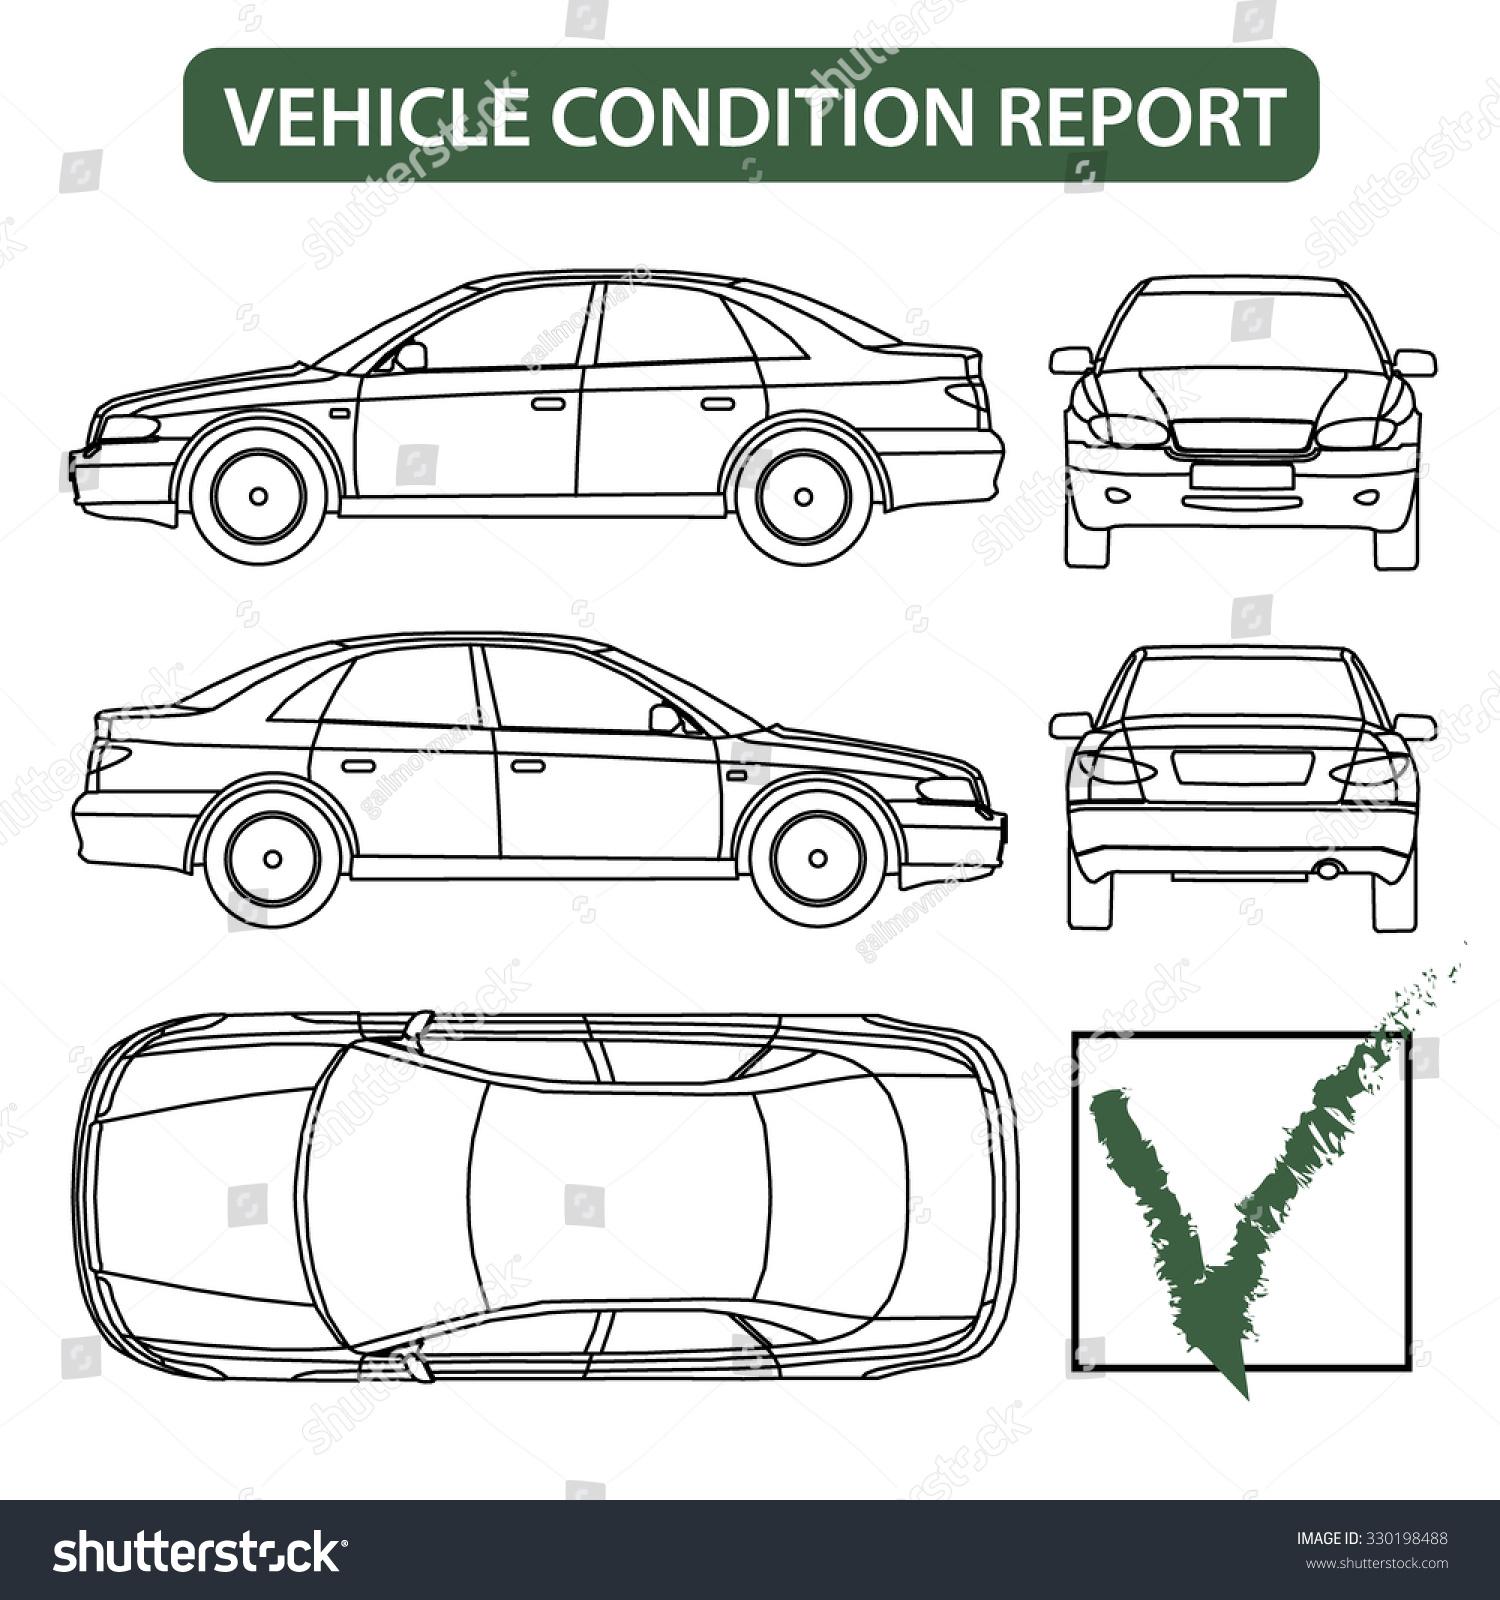 Car Condition Form Vehicle Checklist Auto Stock Vector 330198488 ...